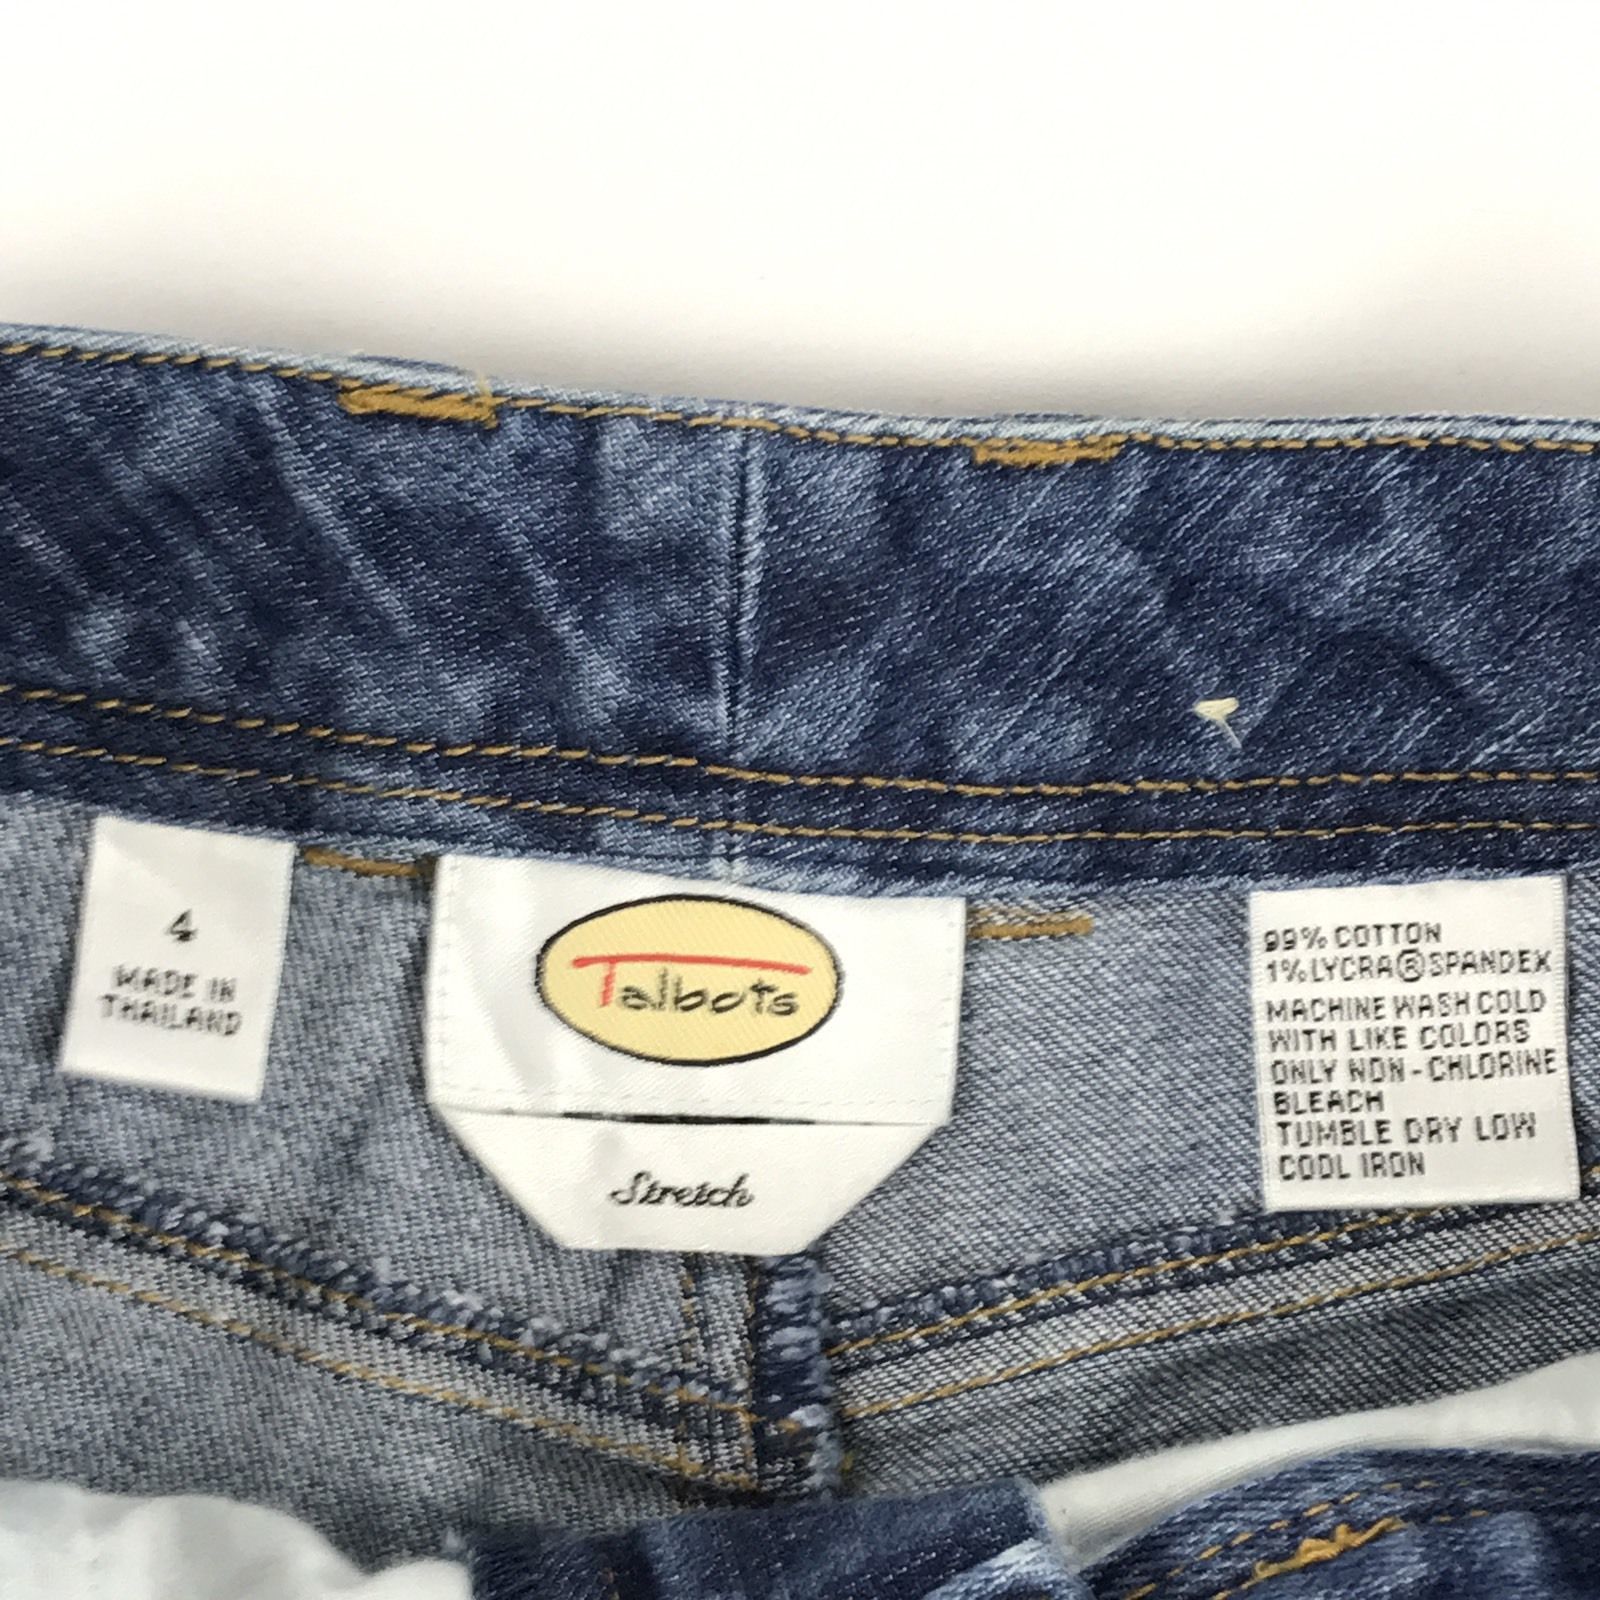 Talbots Stretch Women Jeans 4 Straight Leg Stonewash Relaxed Fit Denim Spandex